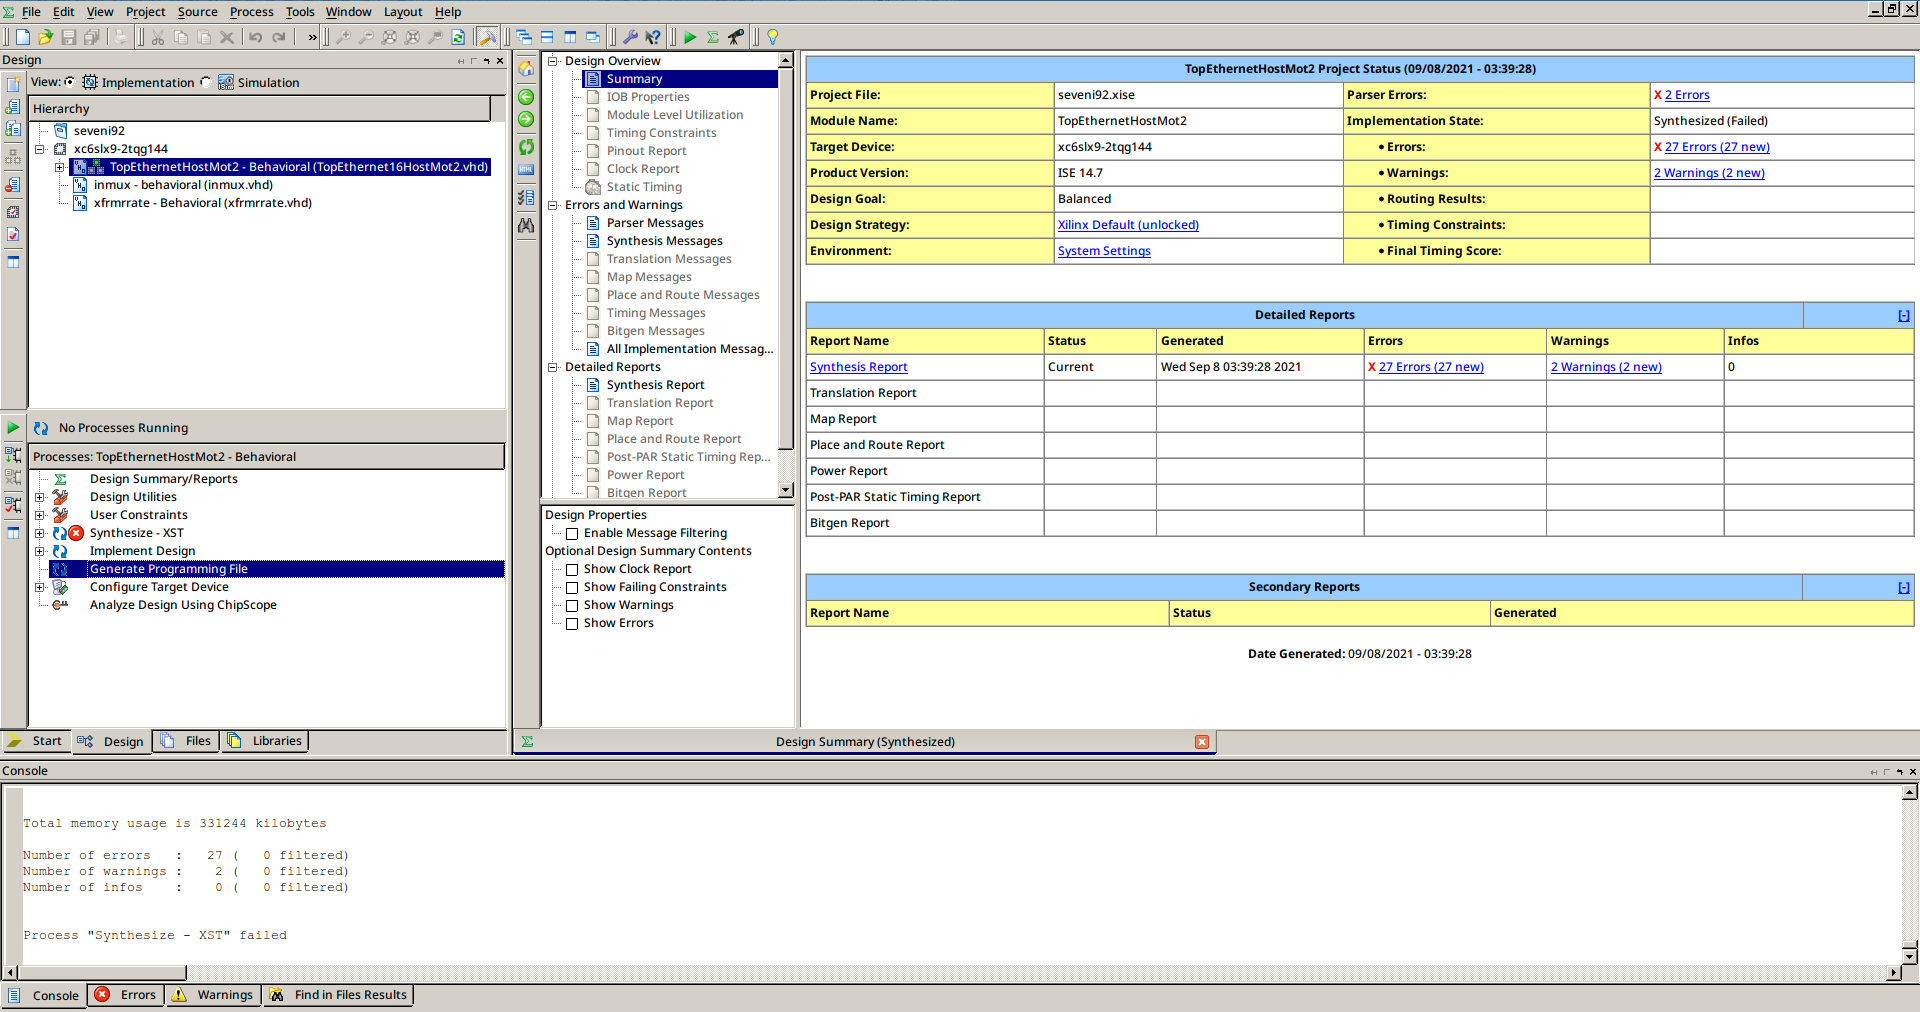 Screenshot_2021-09-08_03-40-13.png